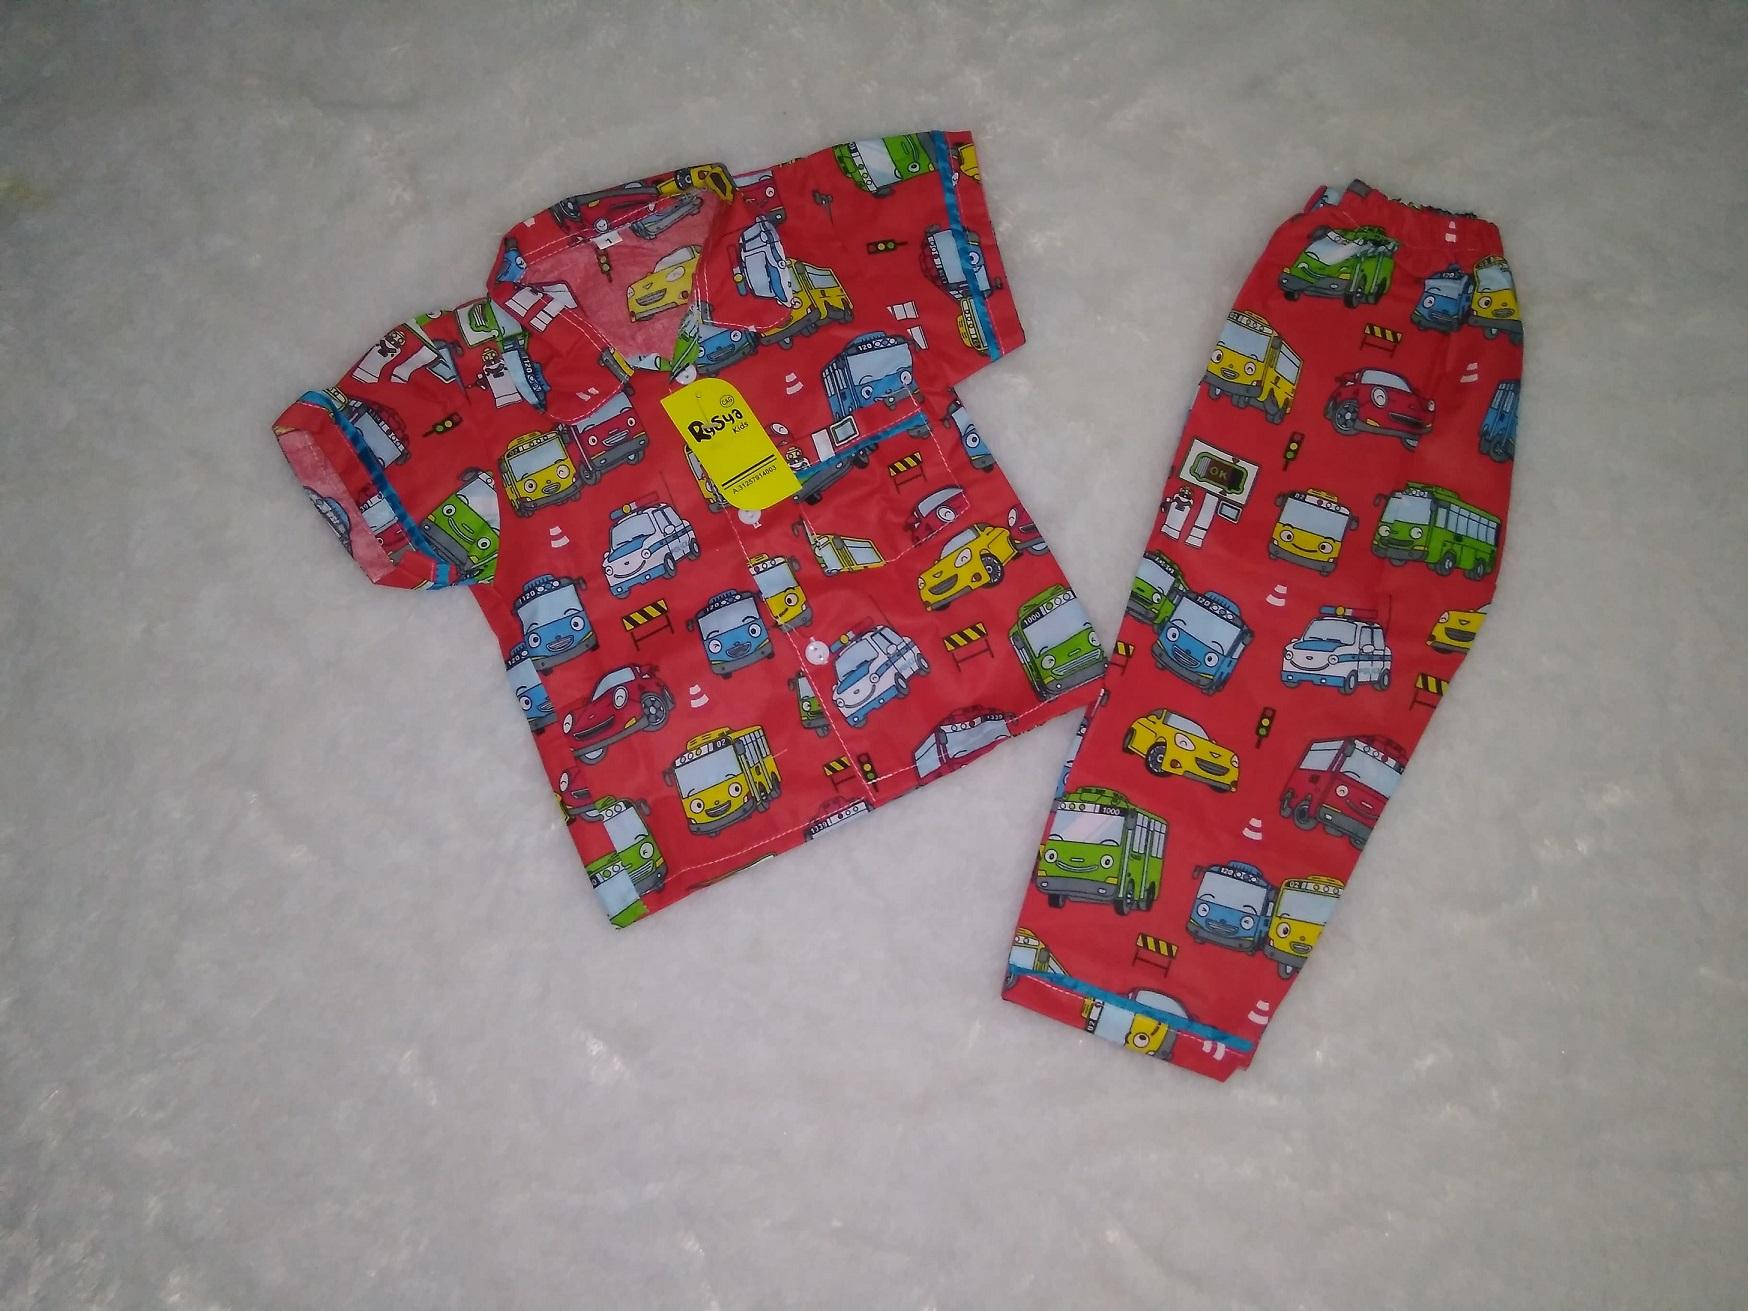 Piyama Anak Karakter Tayo Merah Baju Tidur Katun Rysya Size 1 Pajamas Usia 0 - 1 tahun